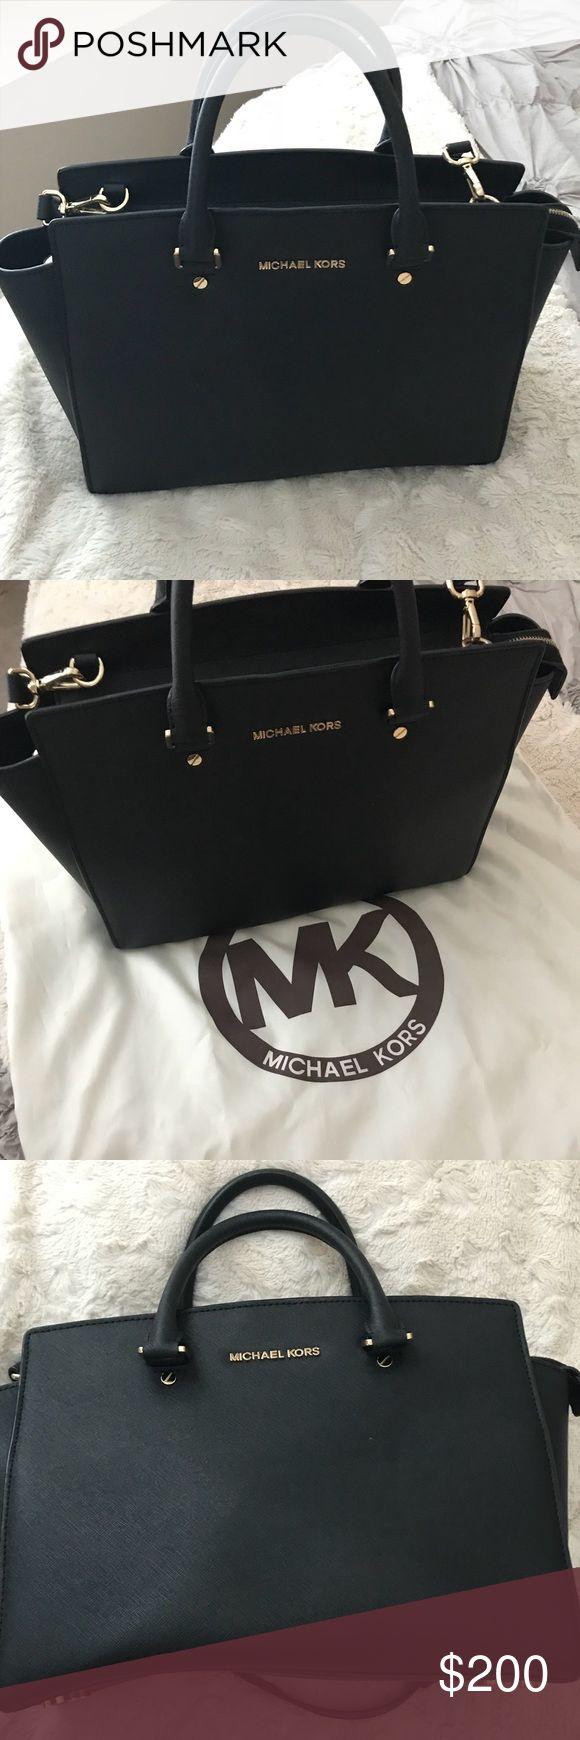 Michael Kors Handbag Authentic Michael Kors Large Selma Saffiano Leather Satchel. Color is black. In Excellent condition. Comes with MK logo satin protective bag. Michael Kors Bags Satchels